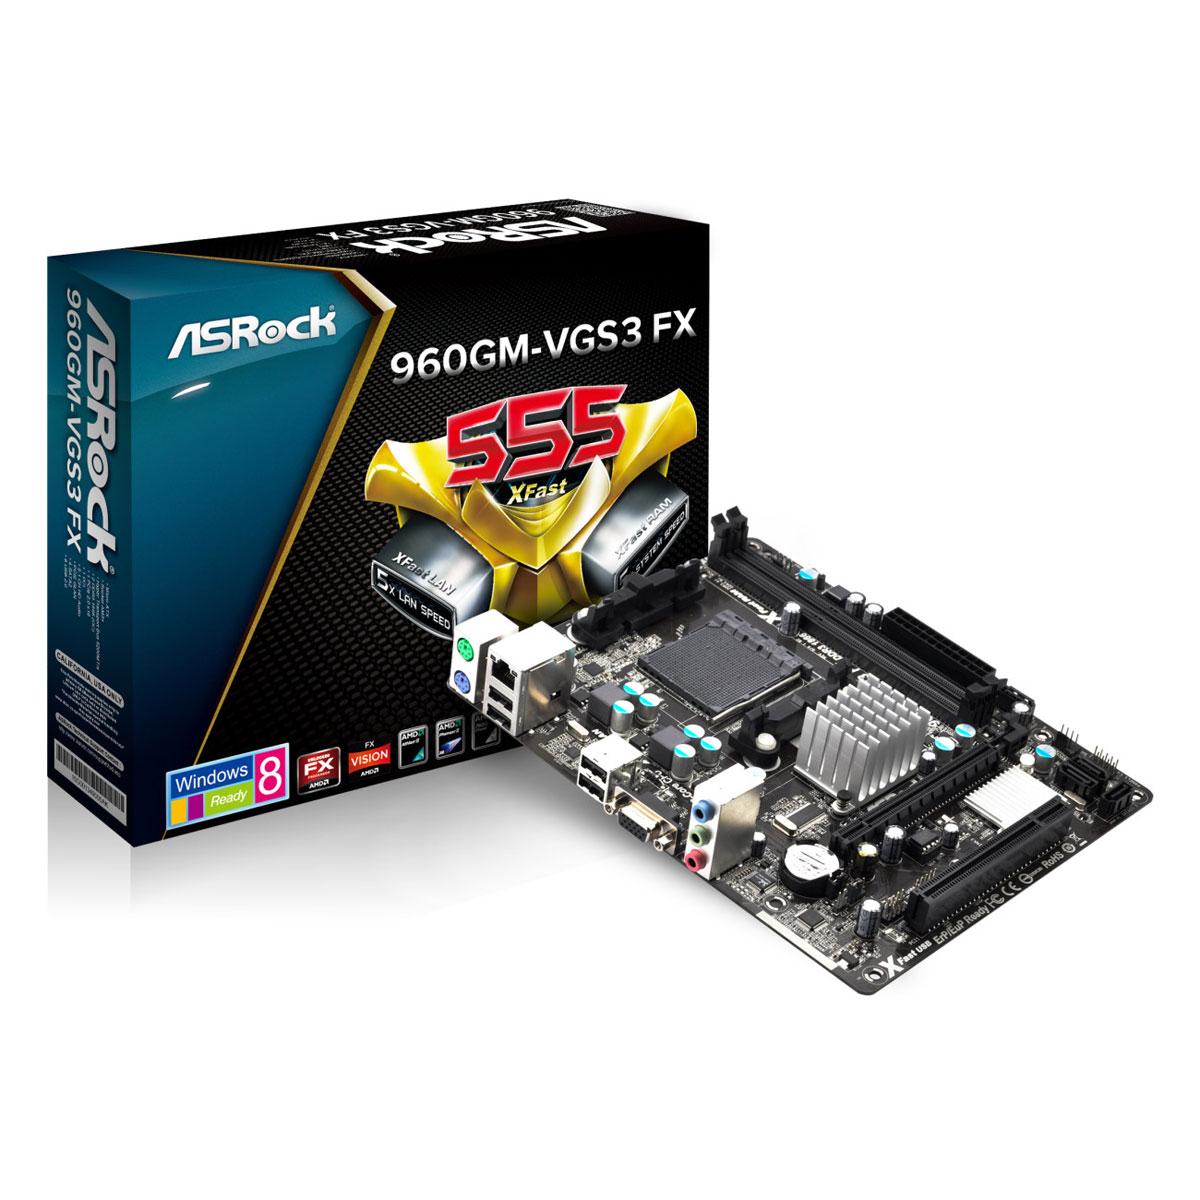 Carte mère ASRock 960GM-VGS3 FX Carte mère Micro ATX Socket AM3/AM3+ AMD Radeon 3000 Vidéo intégrée - SATA 3Gb/s - USB 2.0